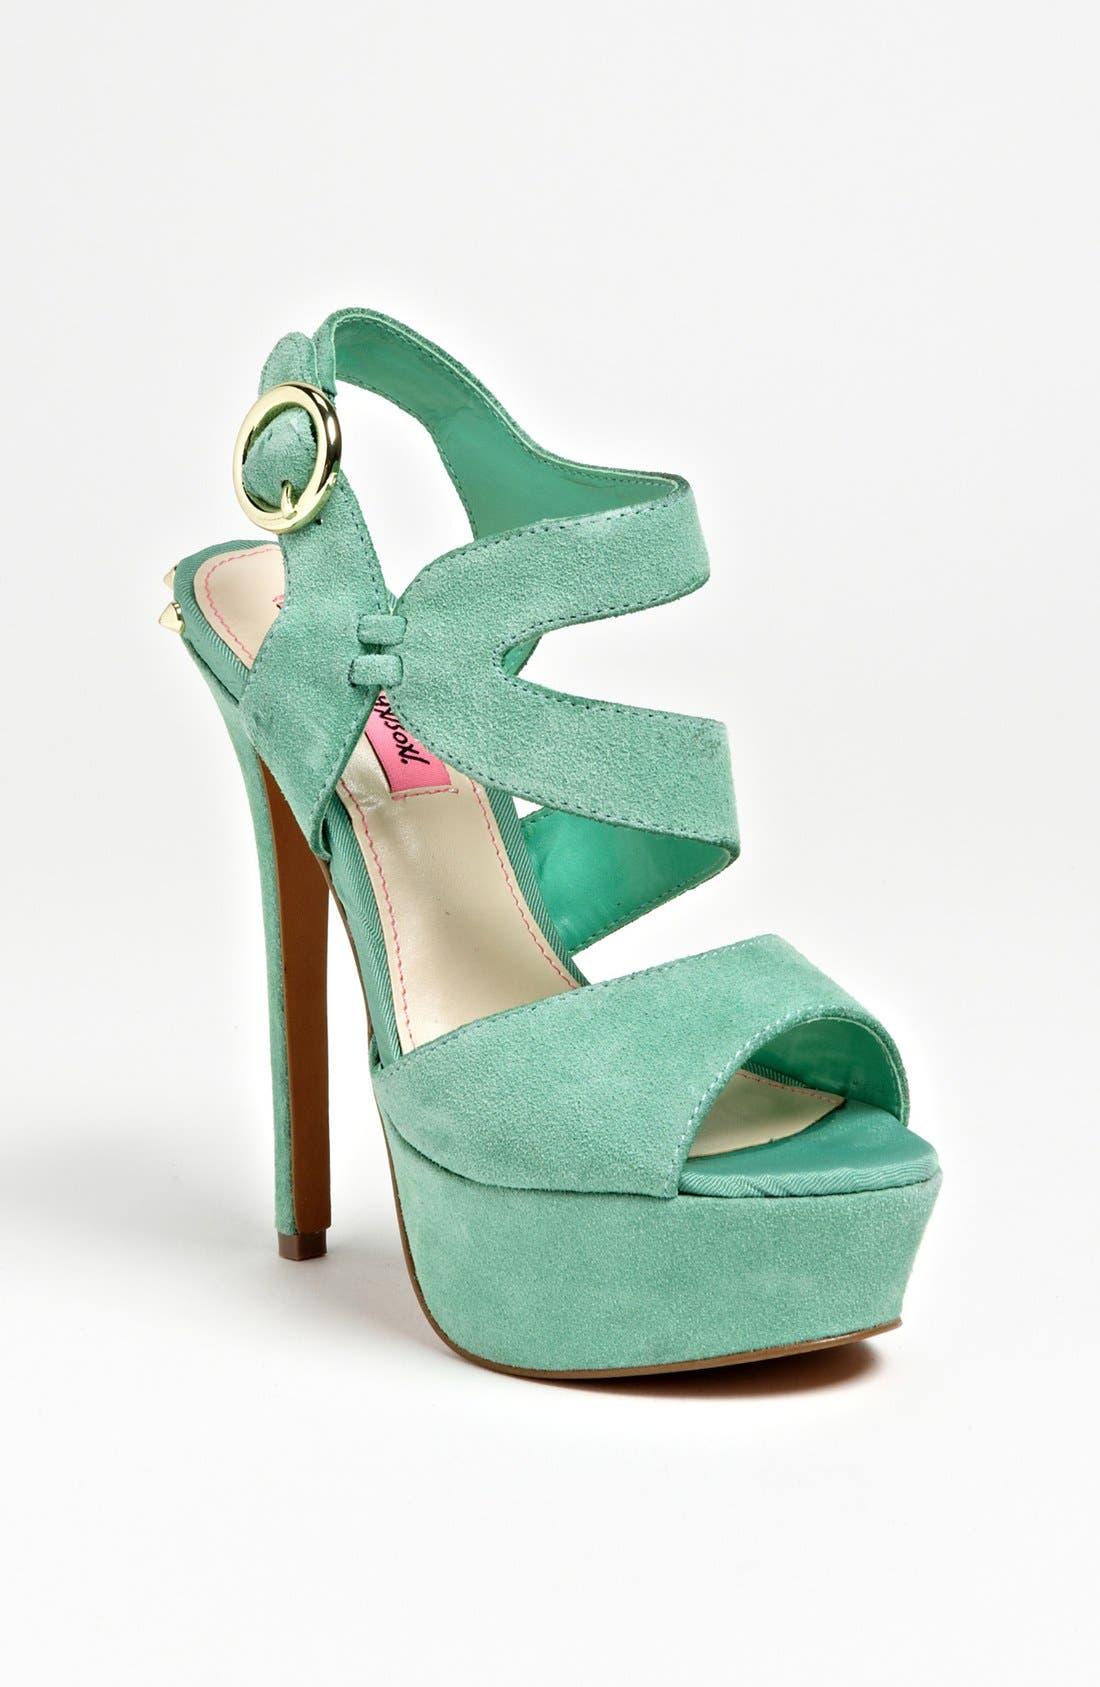 Main Image - Betsey Johnson 'Endall' Sandal